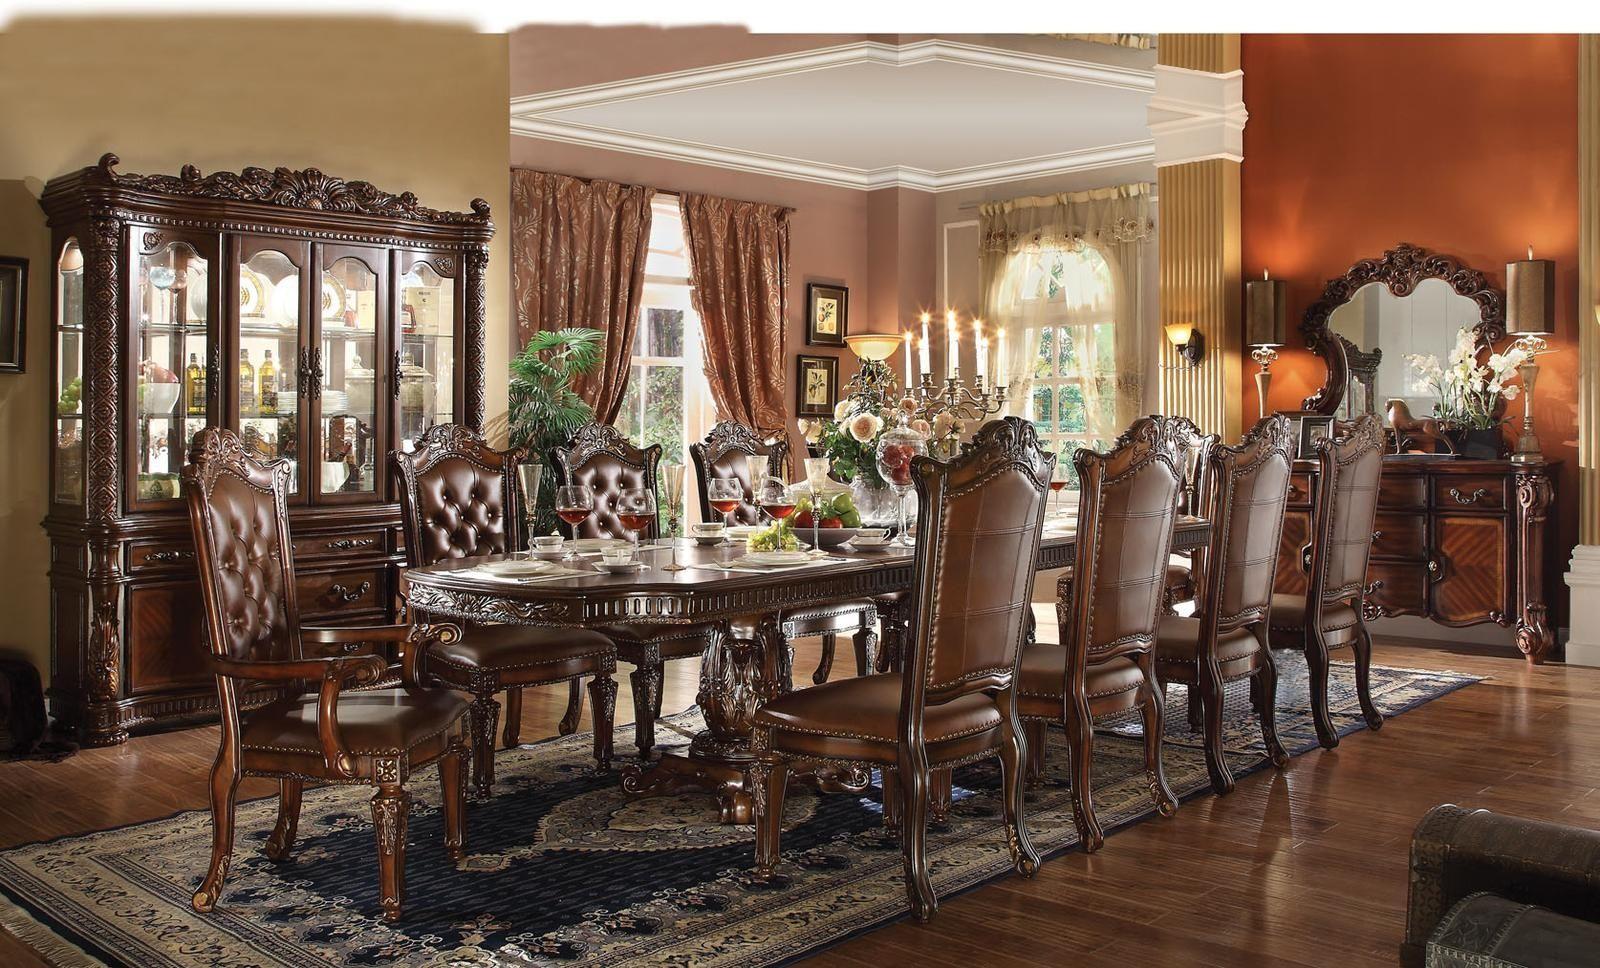 Acme vendome 11pc double pedestal dining room set in cherry dining acme vendome 11pc double pedestal dining room set in cherry dzzzfo